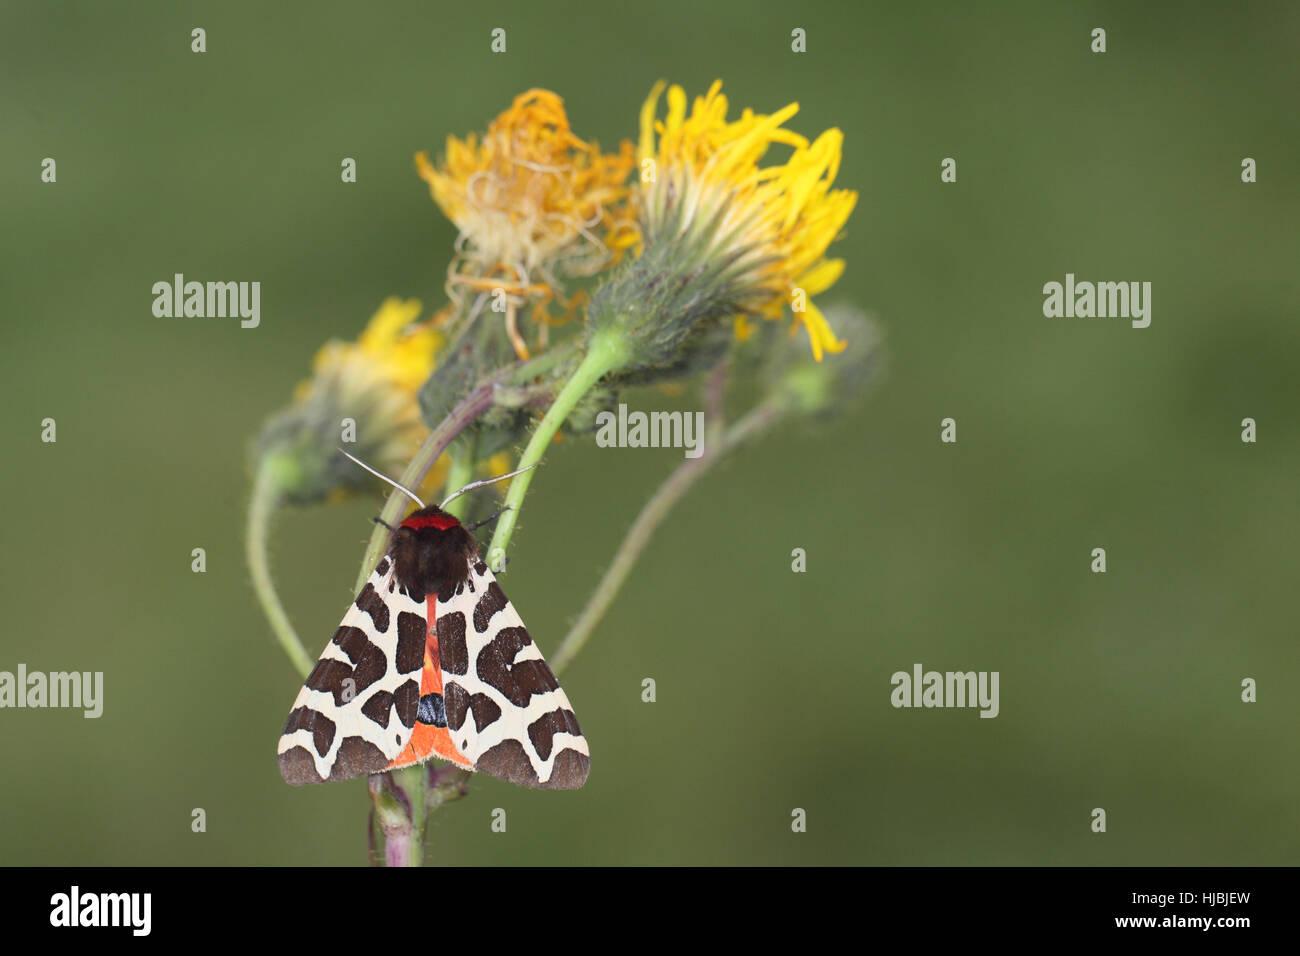 black and yellow moth stockfotos black and yellow moth bilder alamy. Black Bedroom Furniture Sets. Home Design Ideas